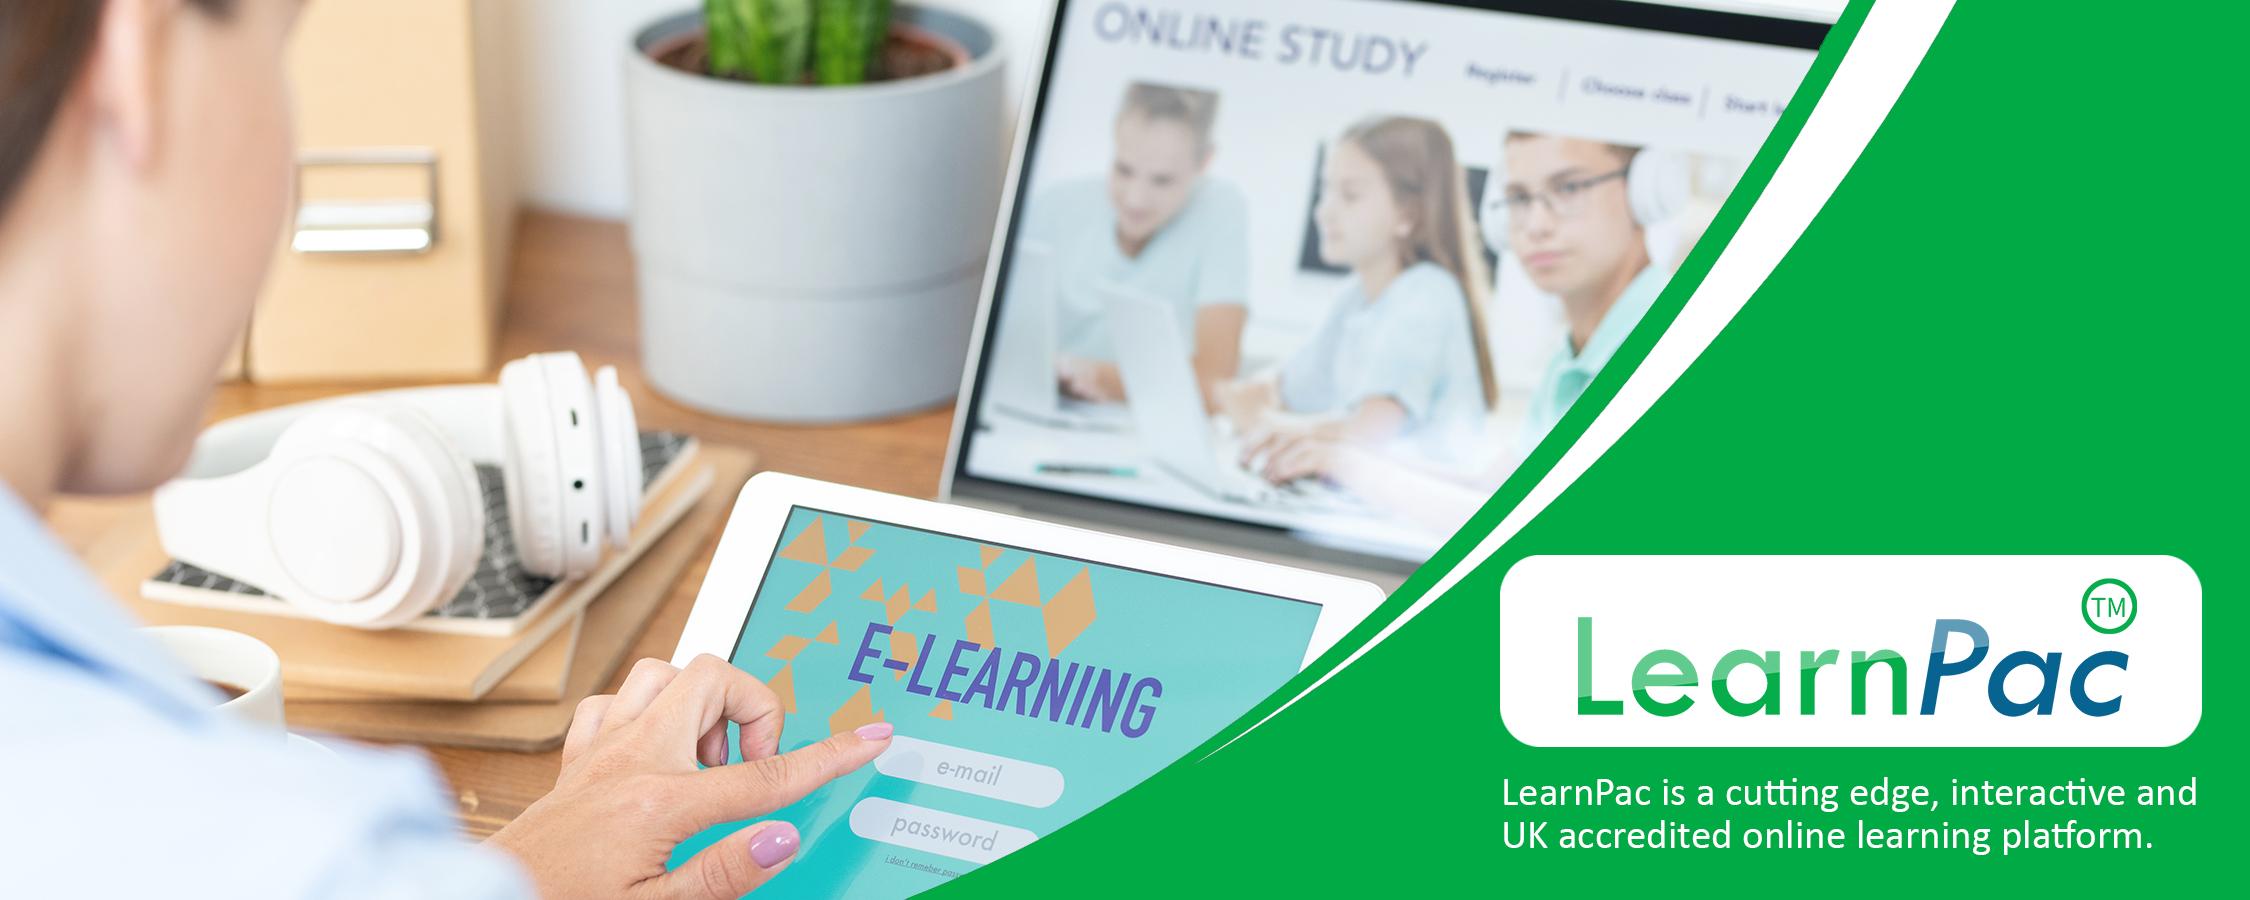 Improving Self-Awareness Training - Online Learning Courses - E-Learning Courses - LearnPac Systems UK -